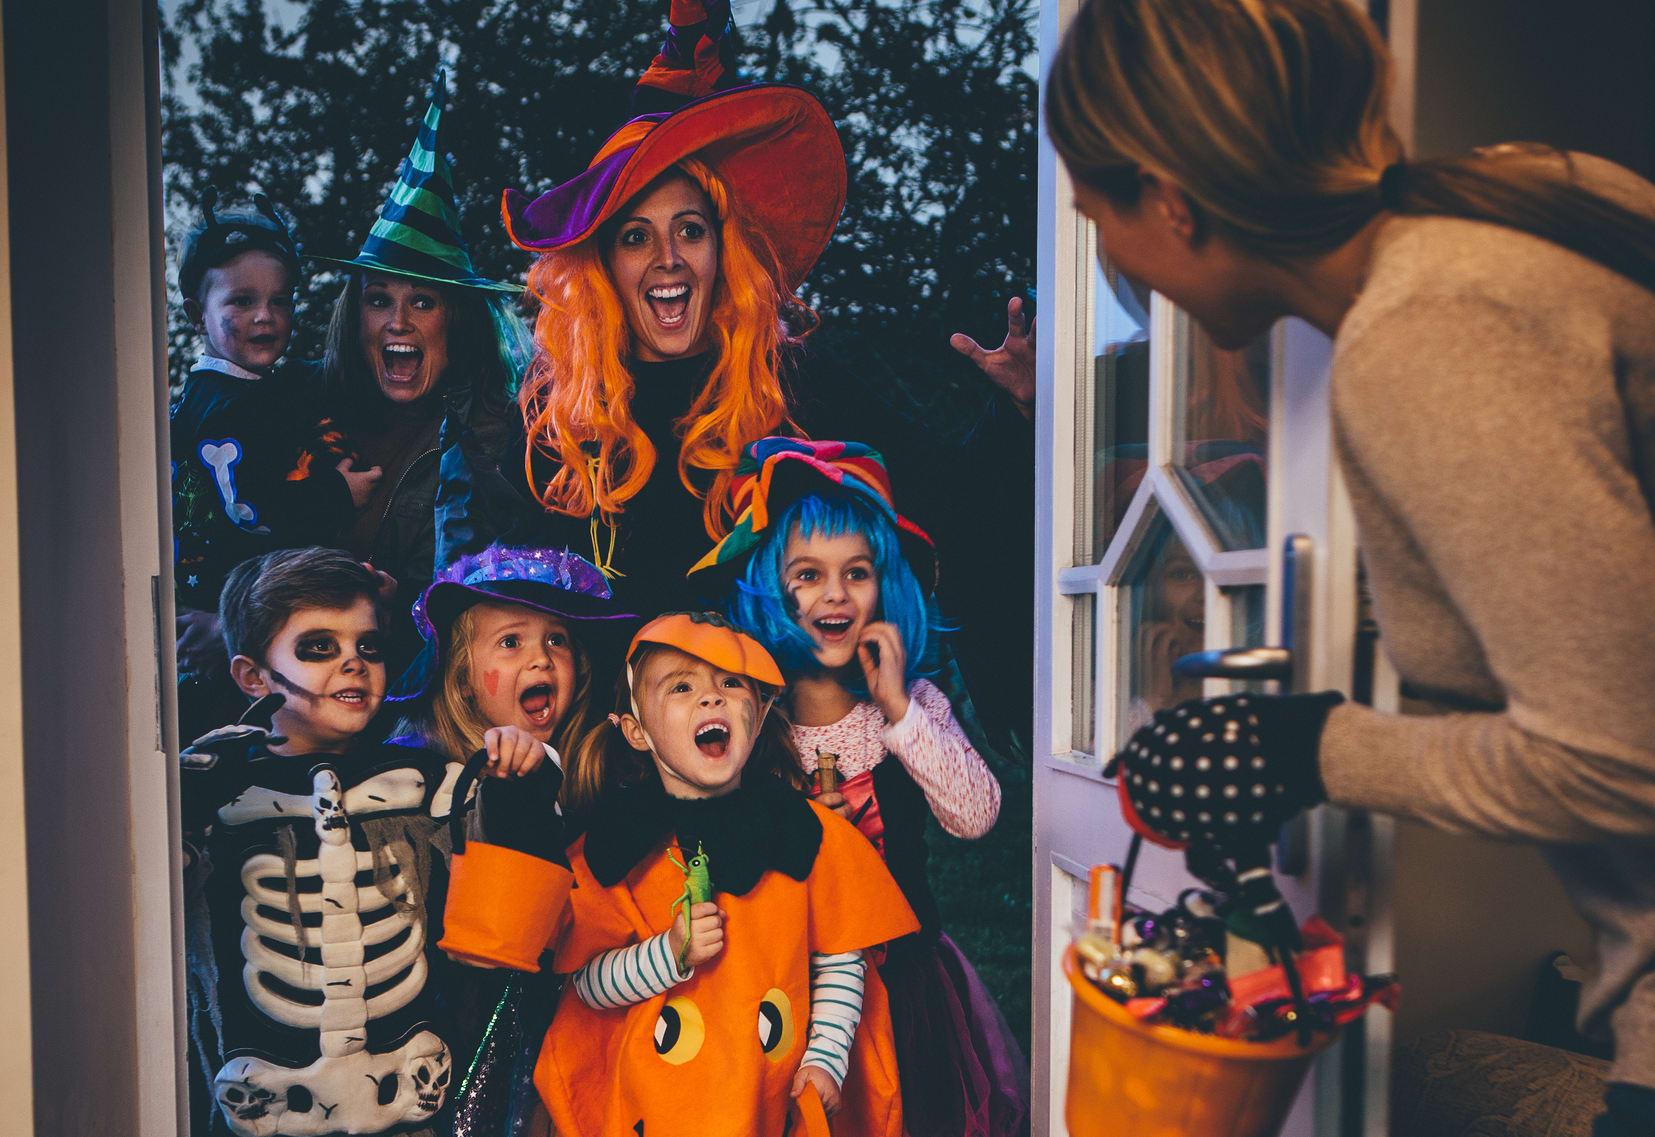 780c9eced 11 Scary-Good Ways to Save on Halloween